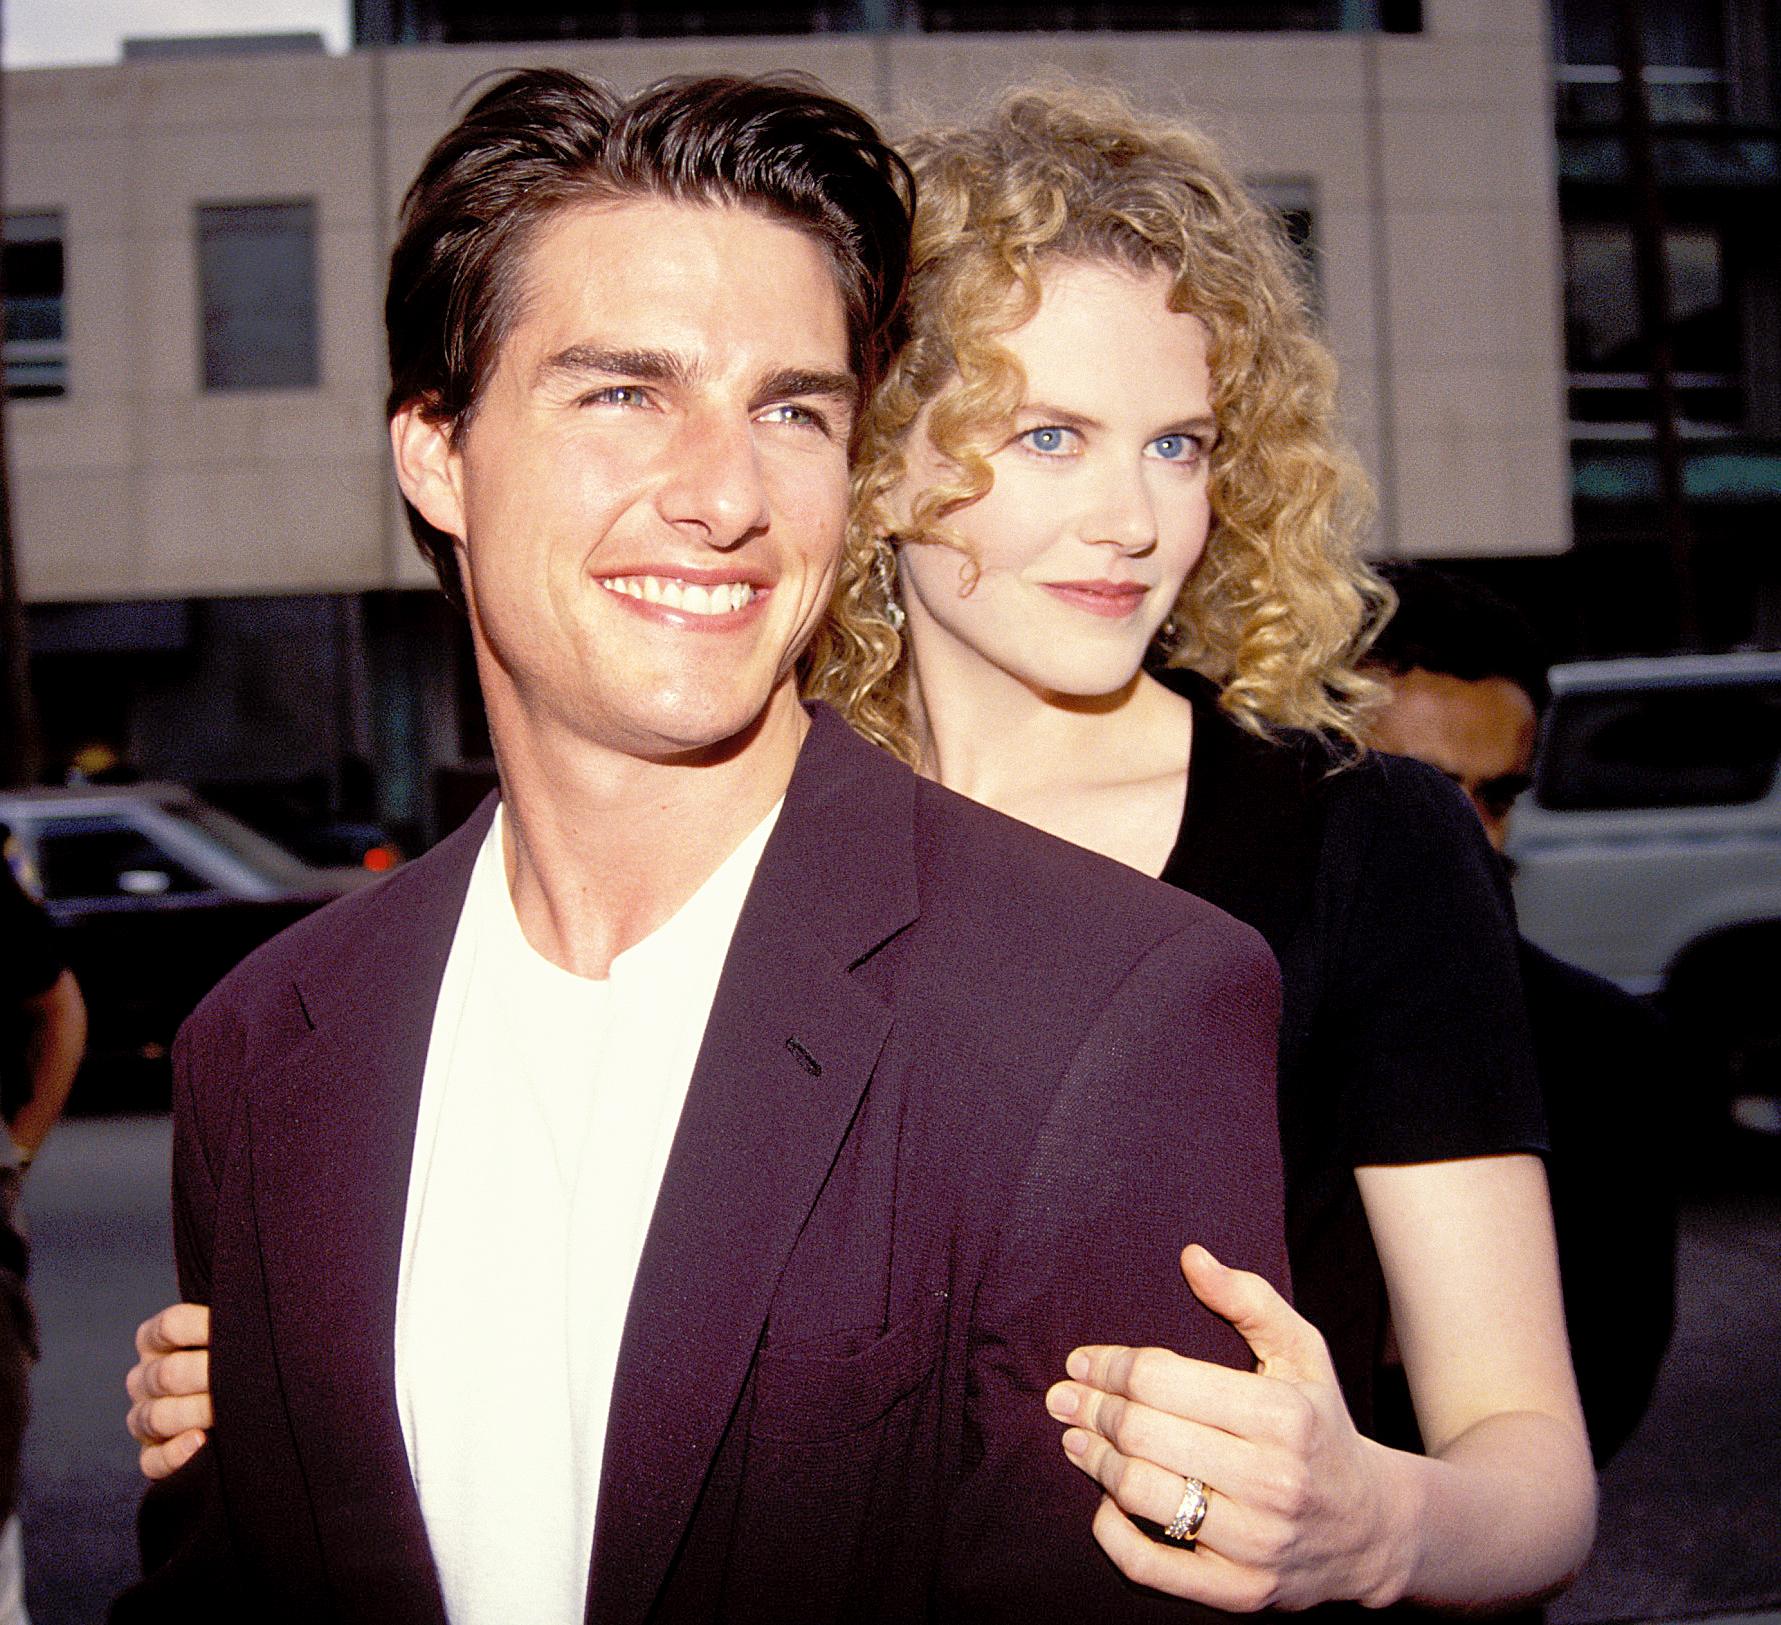 Hugh-Jackman-helped-Nicole-Kidman-Tom-Cruise-divorce